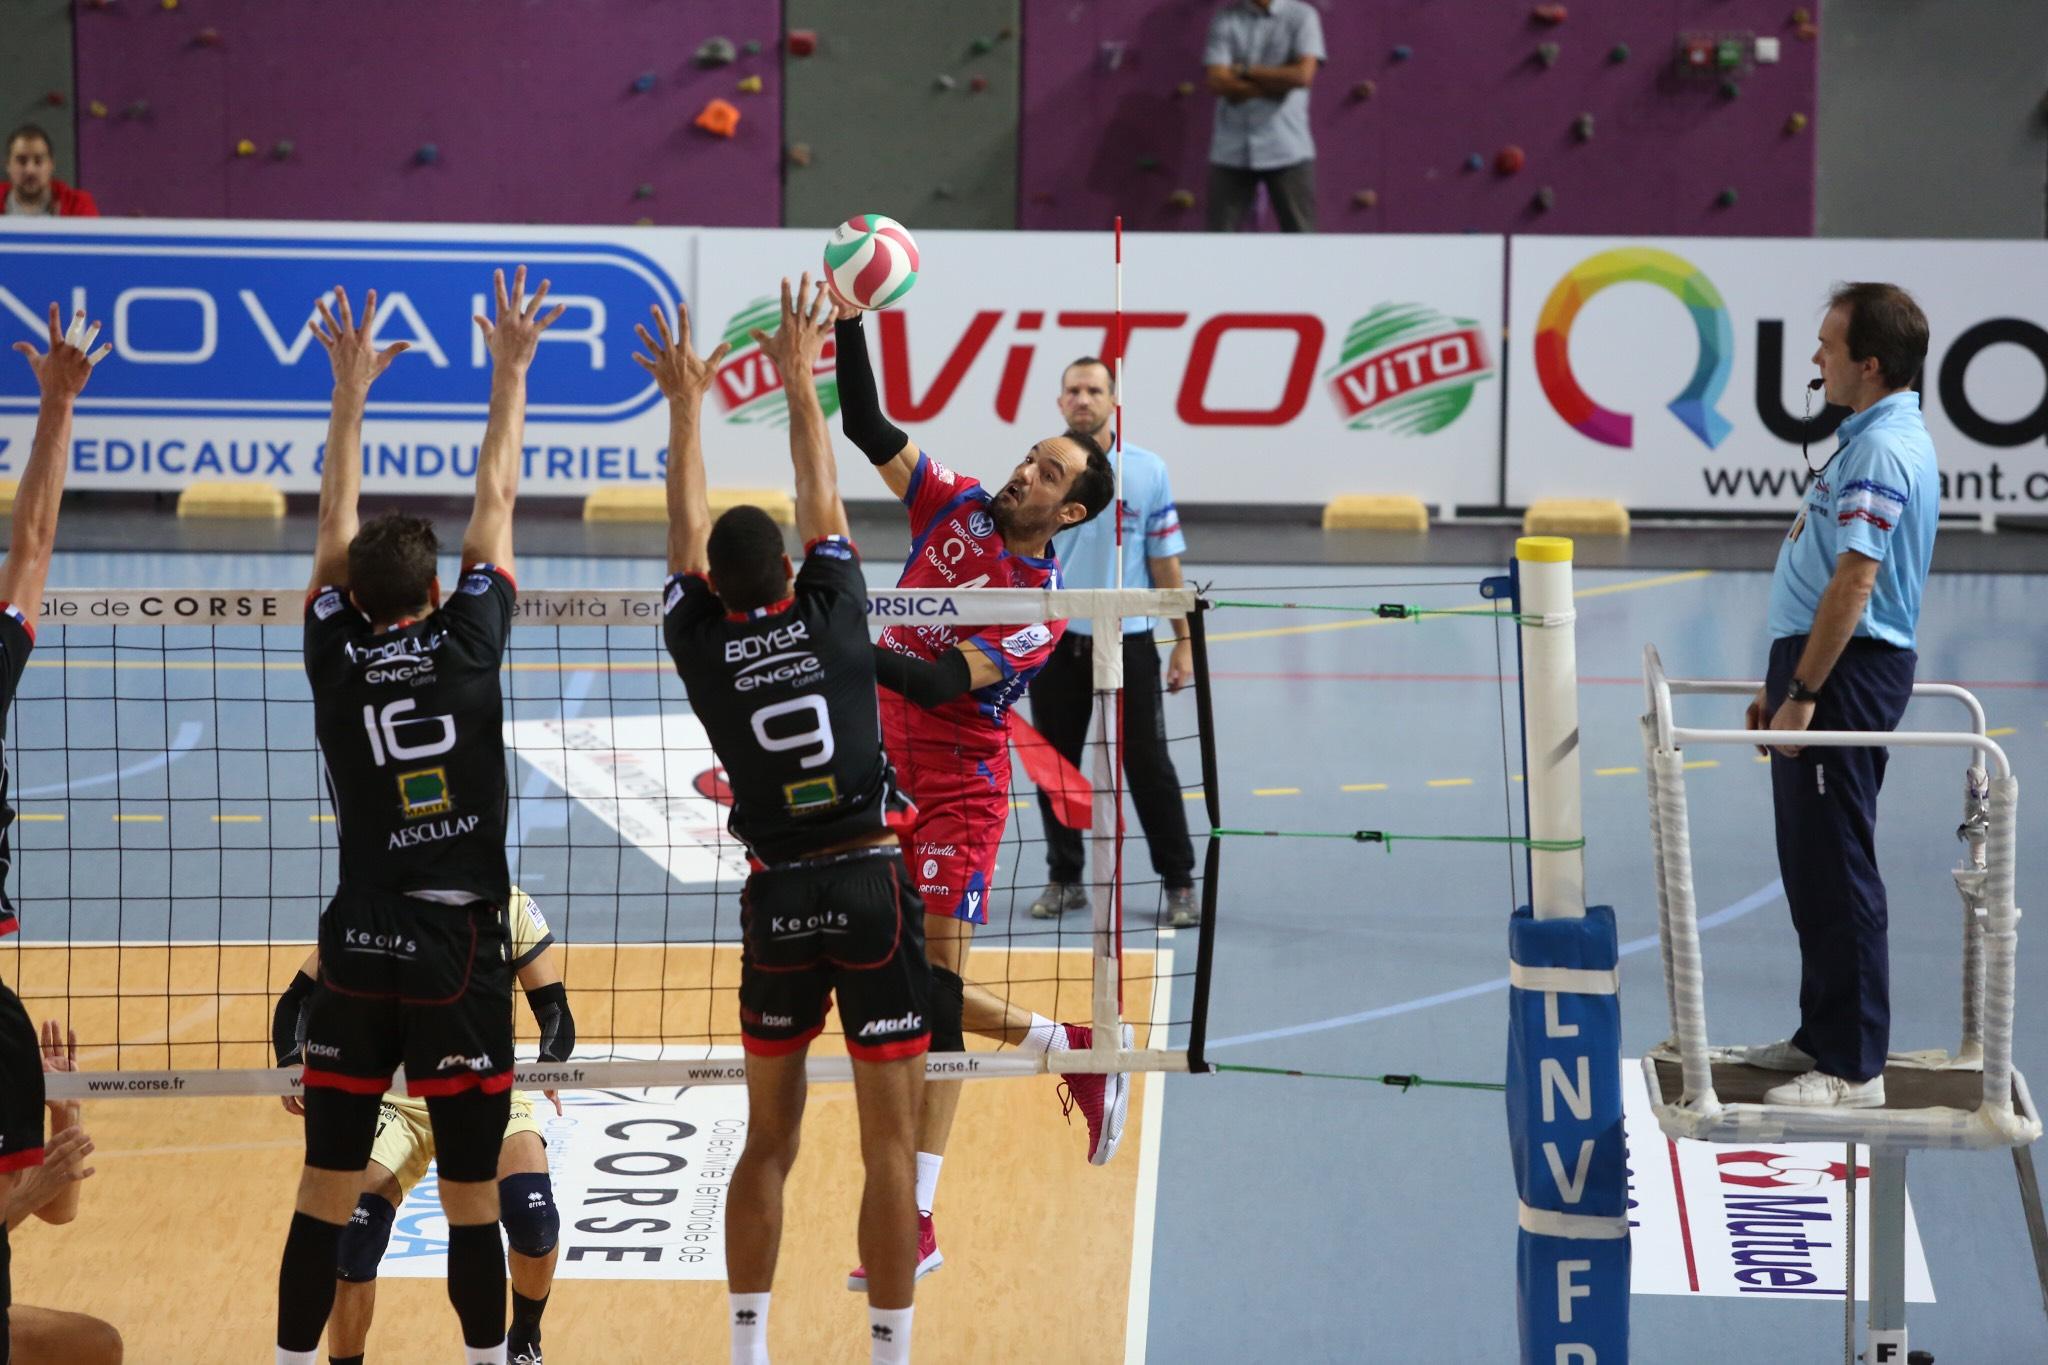 Volley : Ajaccio bute sur Chaumont (0-3)